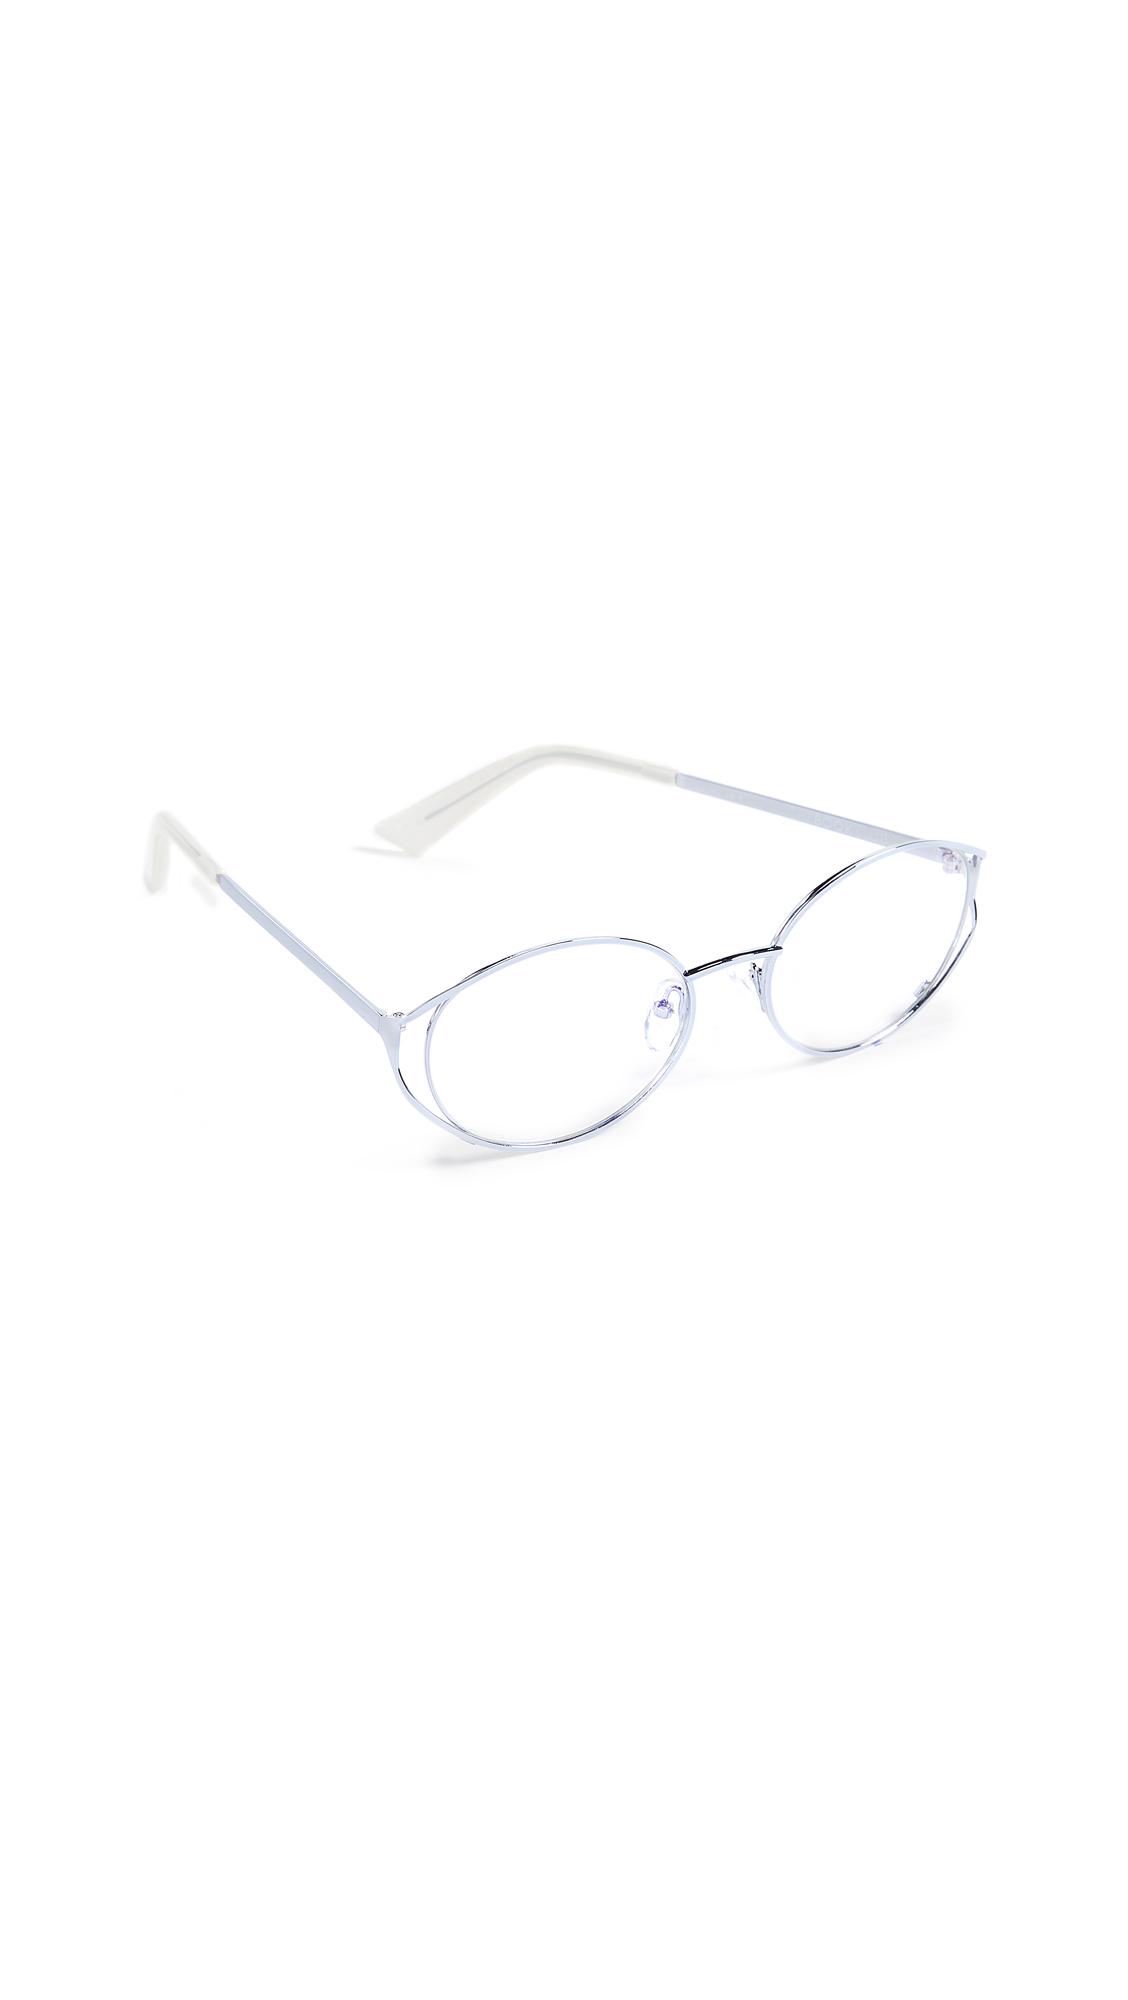 THE BOOK CLUB Spatula Glasses in Silver Cyan